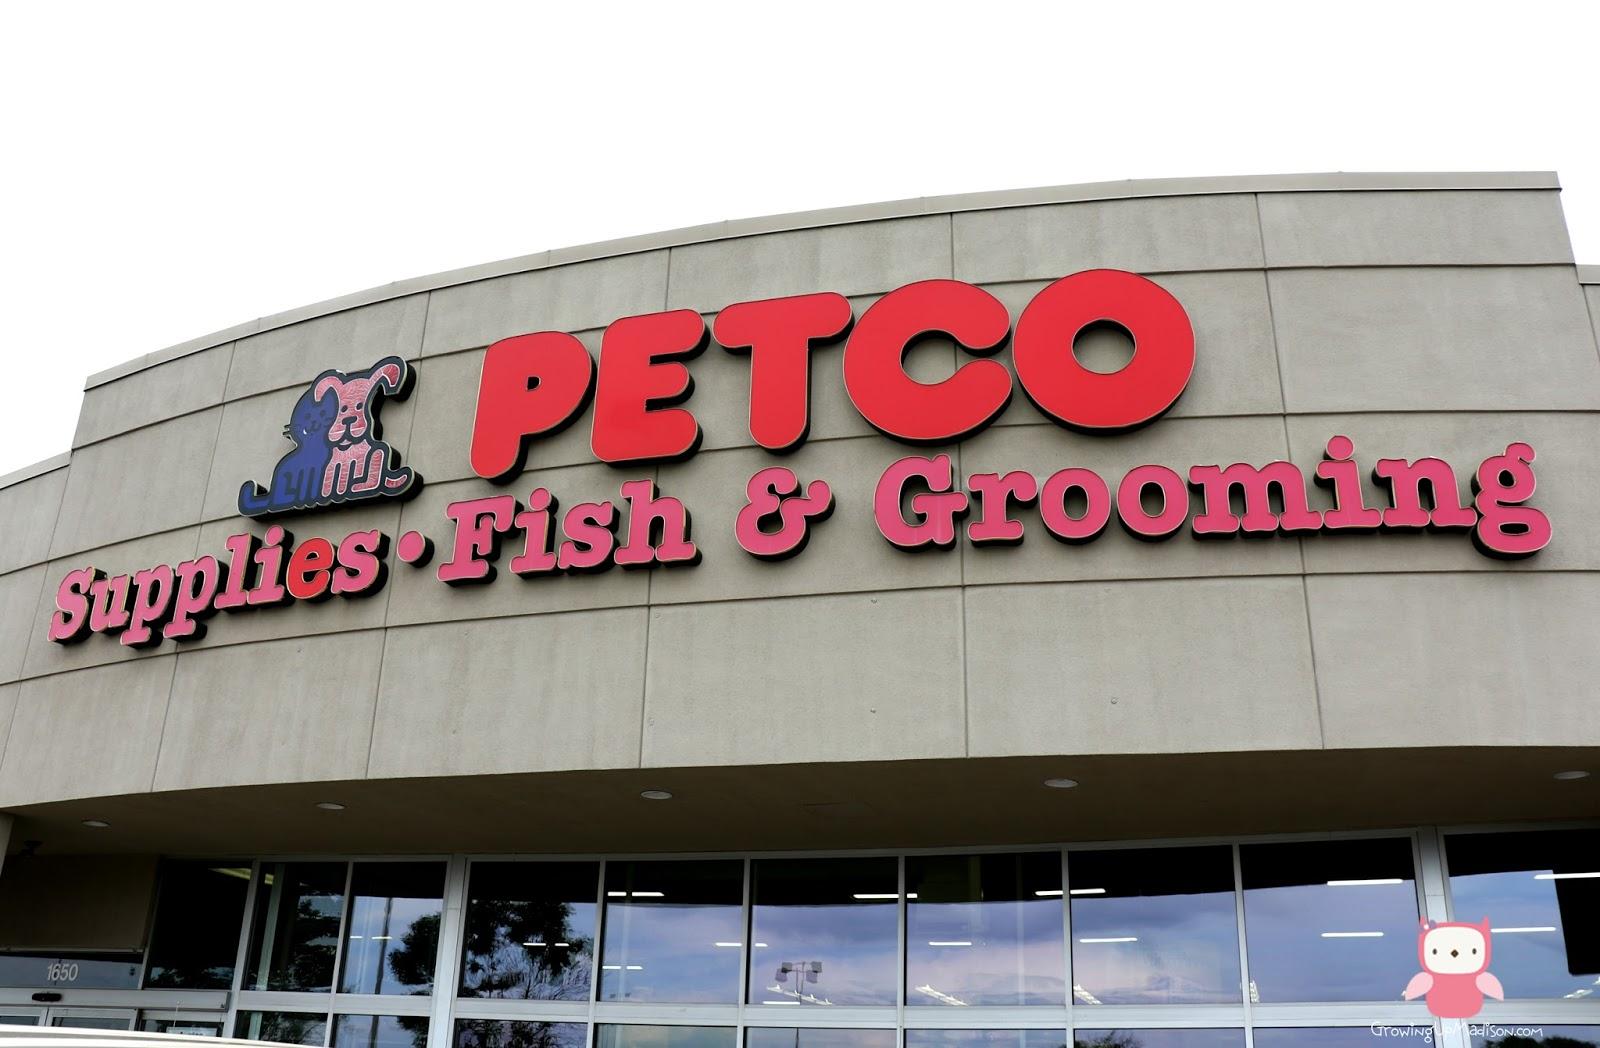 Bentley's Petco Grooming Experience - #PetcoGrooming #MM